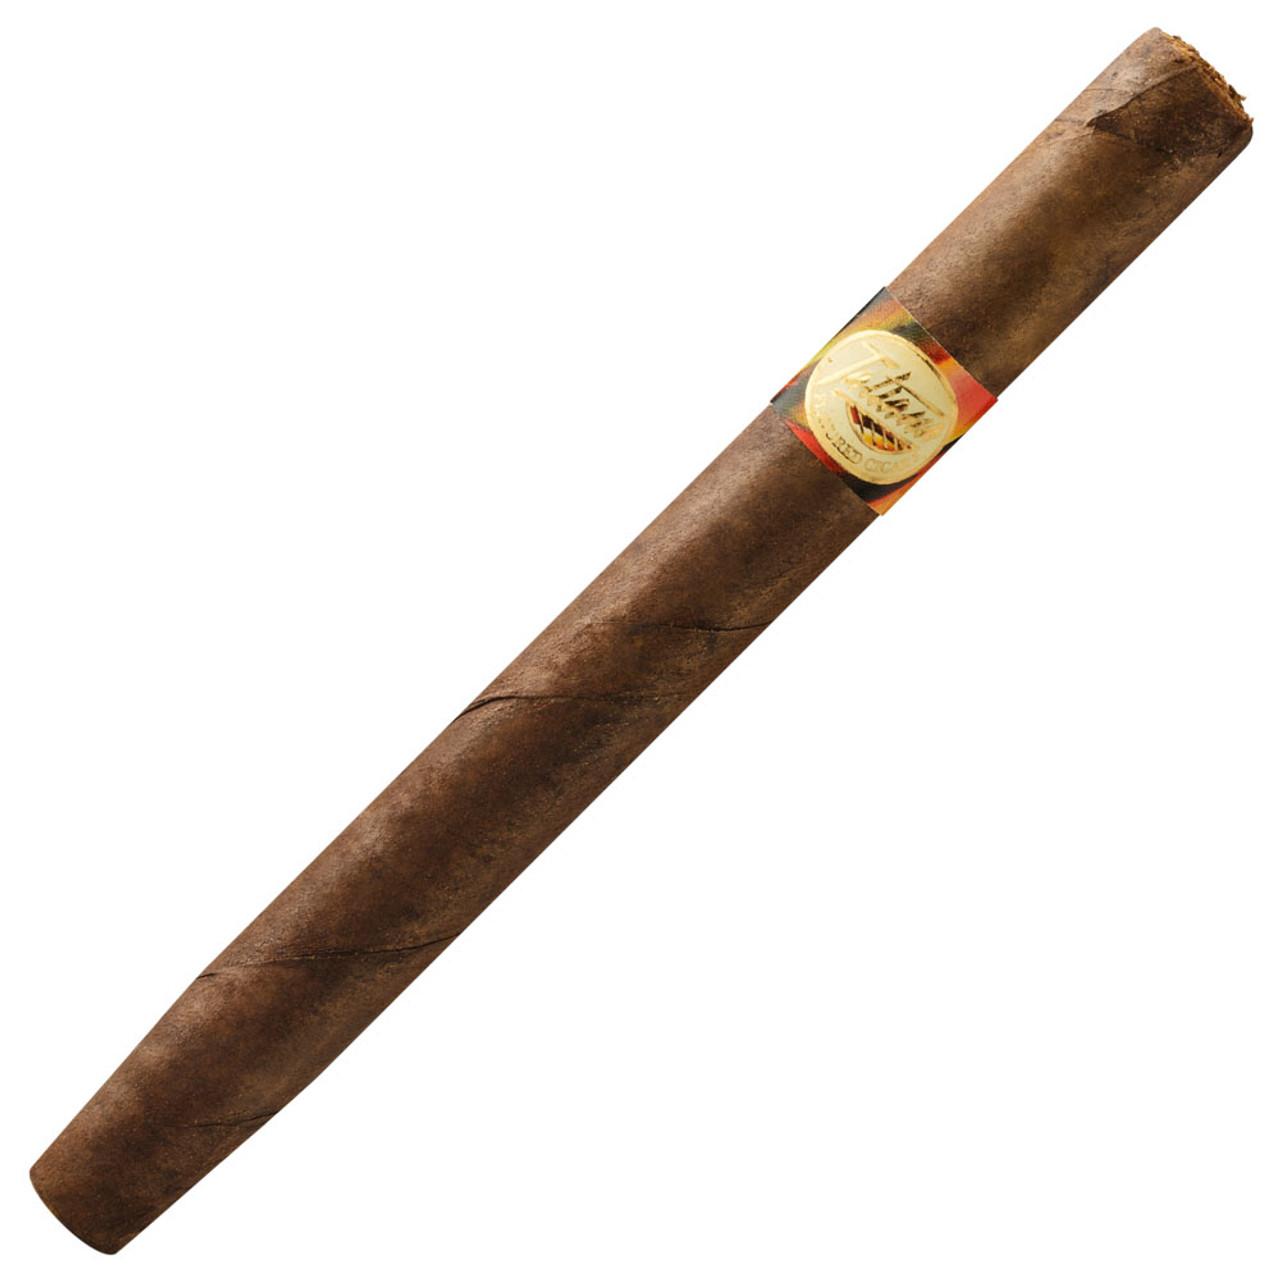 Tatiana Dolce Mandarine Cigars - 5 x 30 (Box of 50)